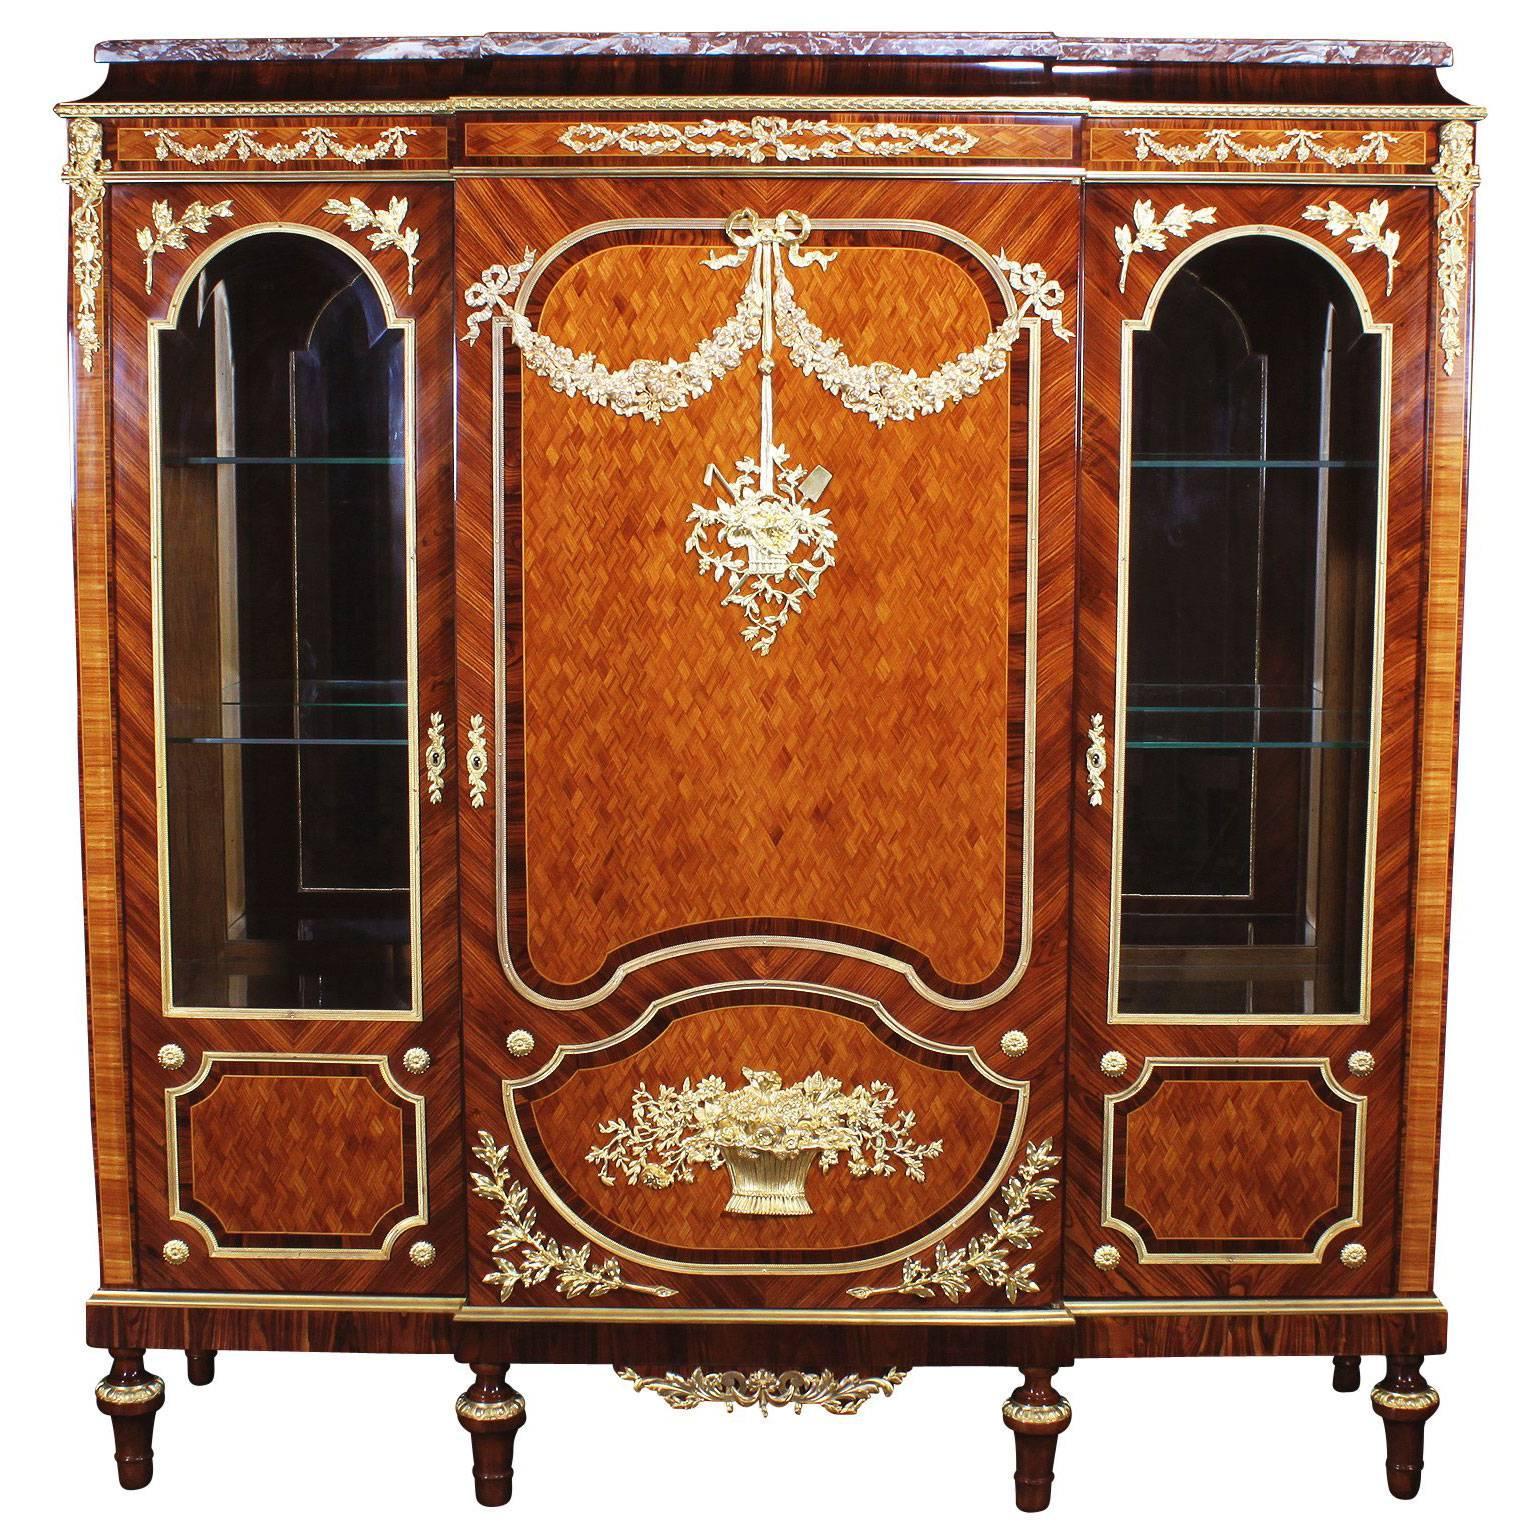 French 19th-20th Century Louis XVI Style Mahogany, Kingwood Parquetry Vitrine